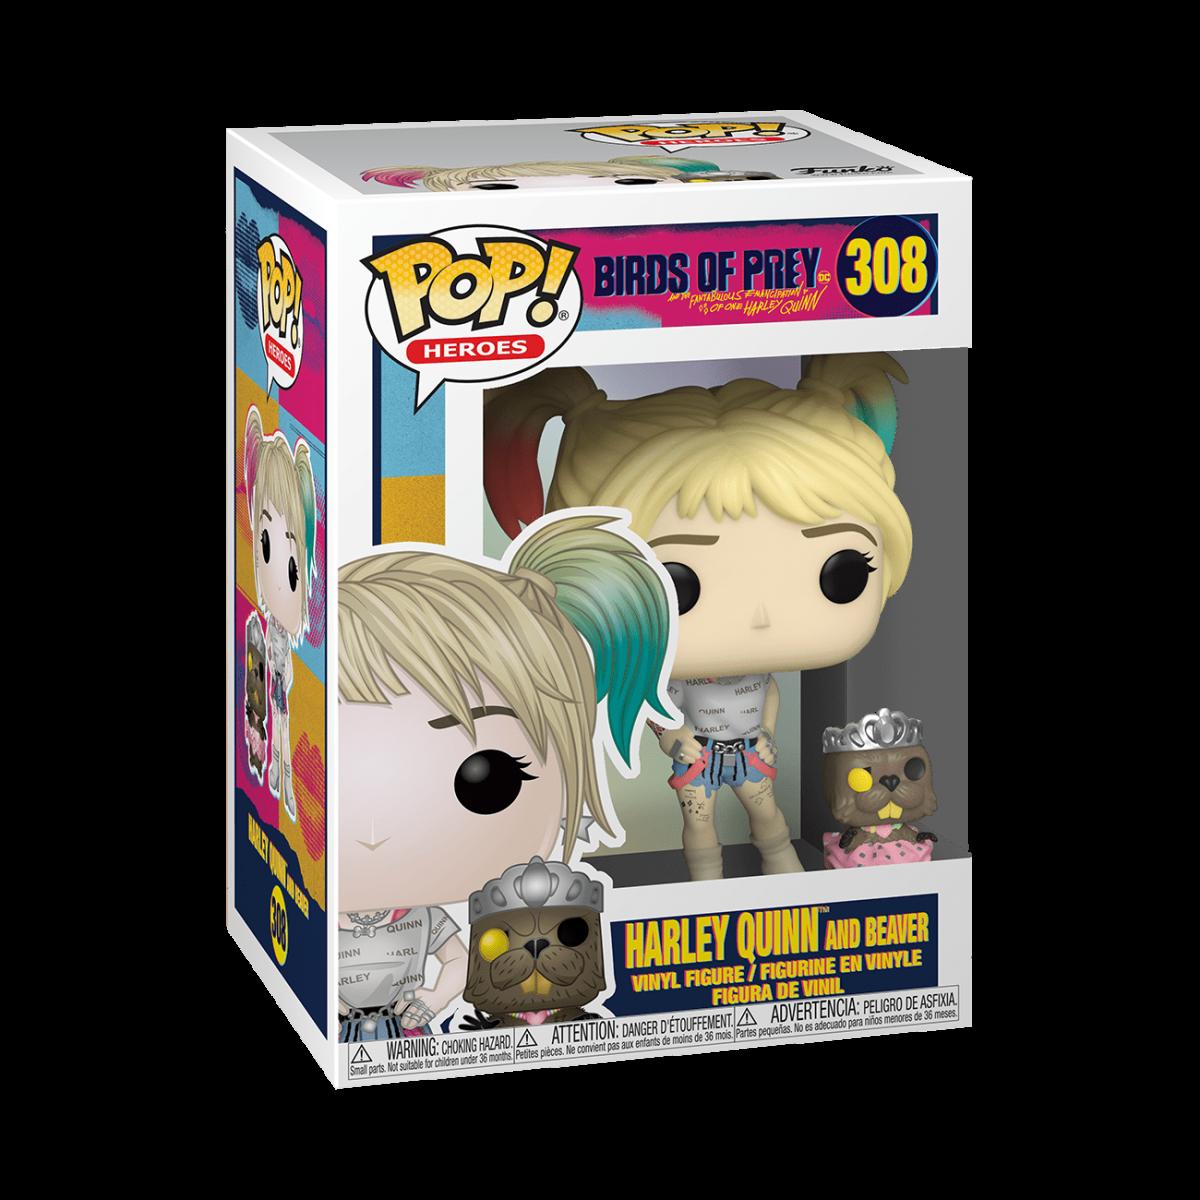 The Birds Of Prey Funko Pop Mystery Minis Are Now Available Funko Fanatics